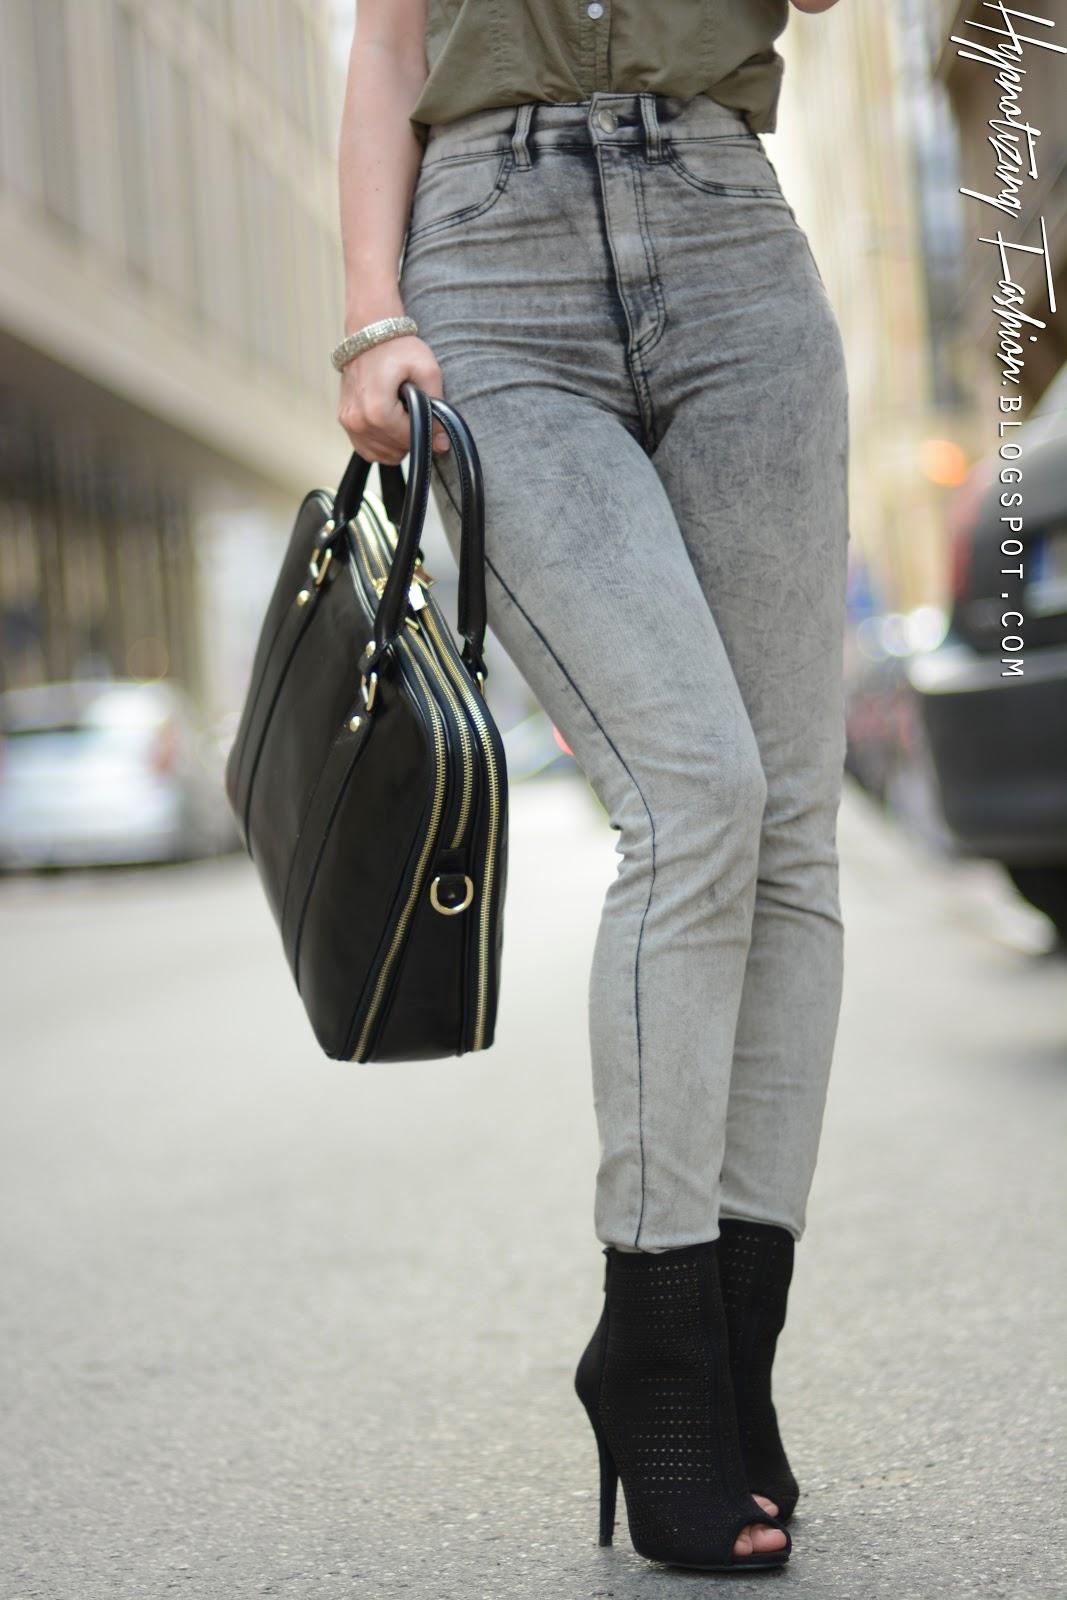 szare jeansy stylizacje